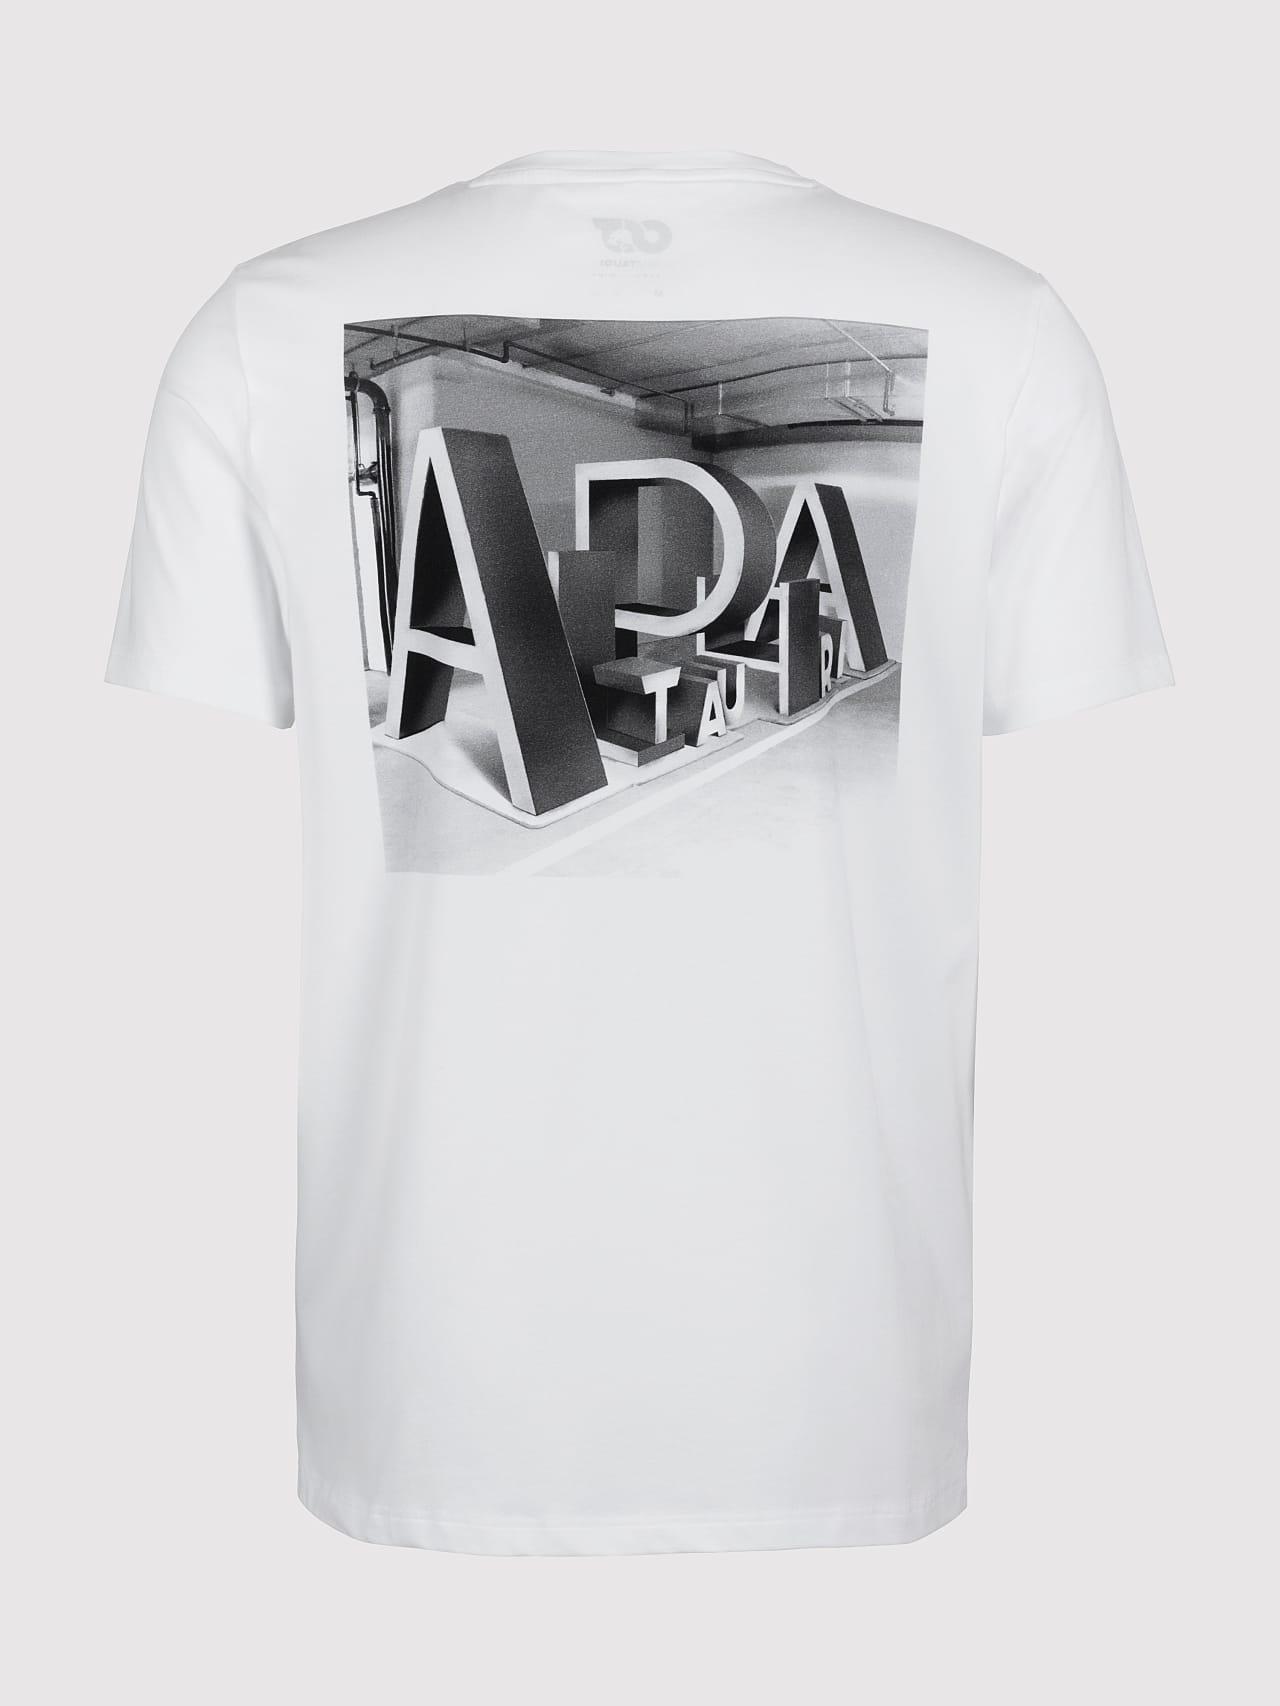 JALIP V1.Y5.01 Cotton Crew-Neck T-Shirt white Left Alpha Tauri